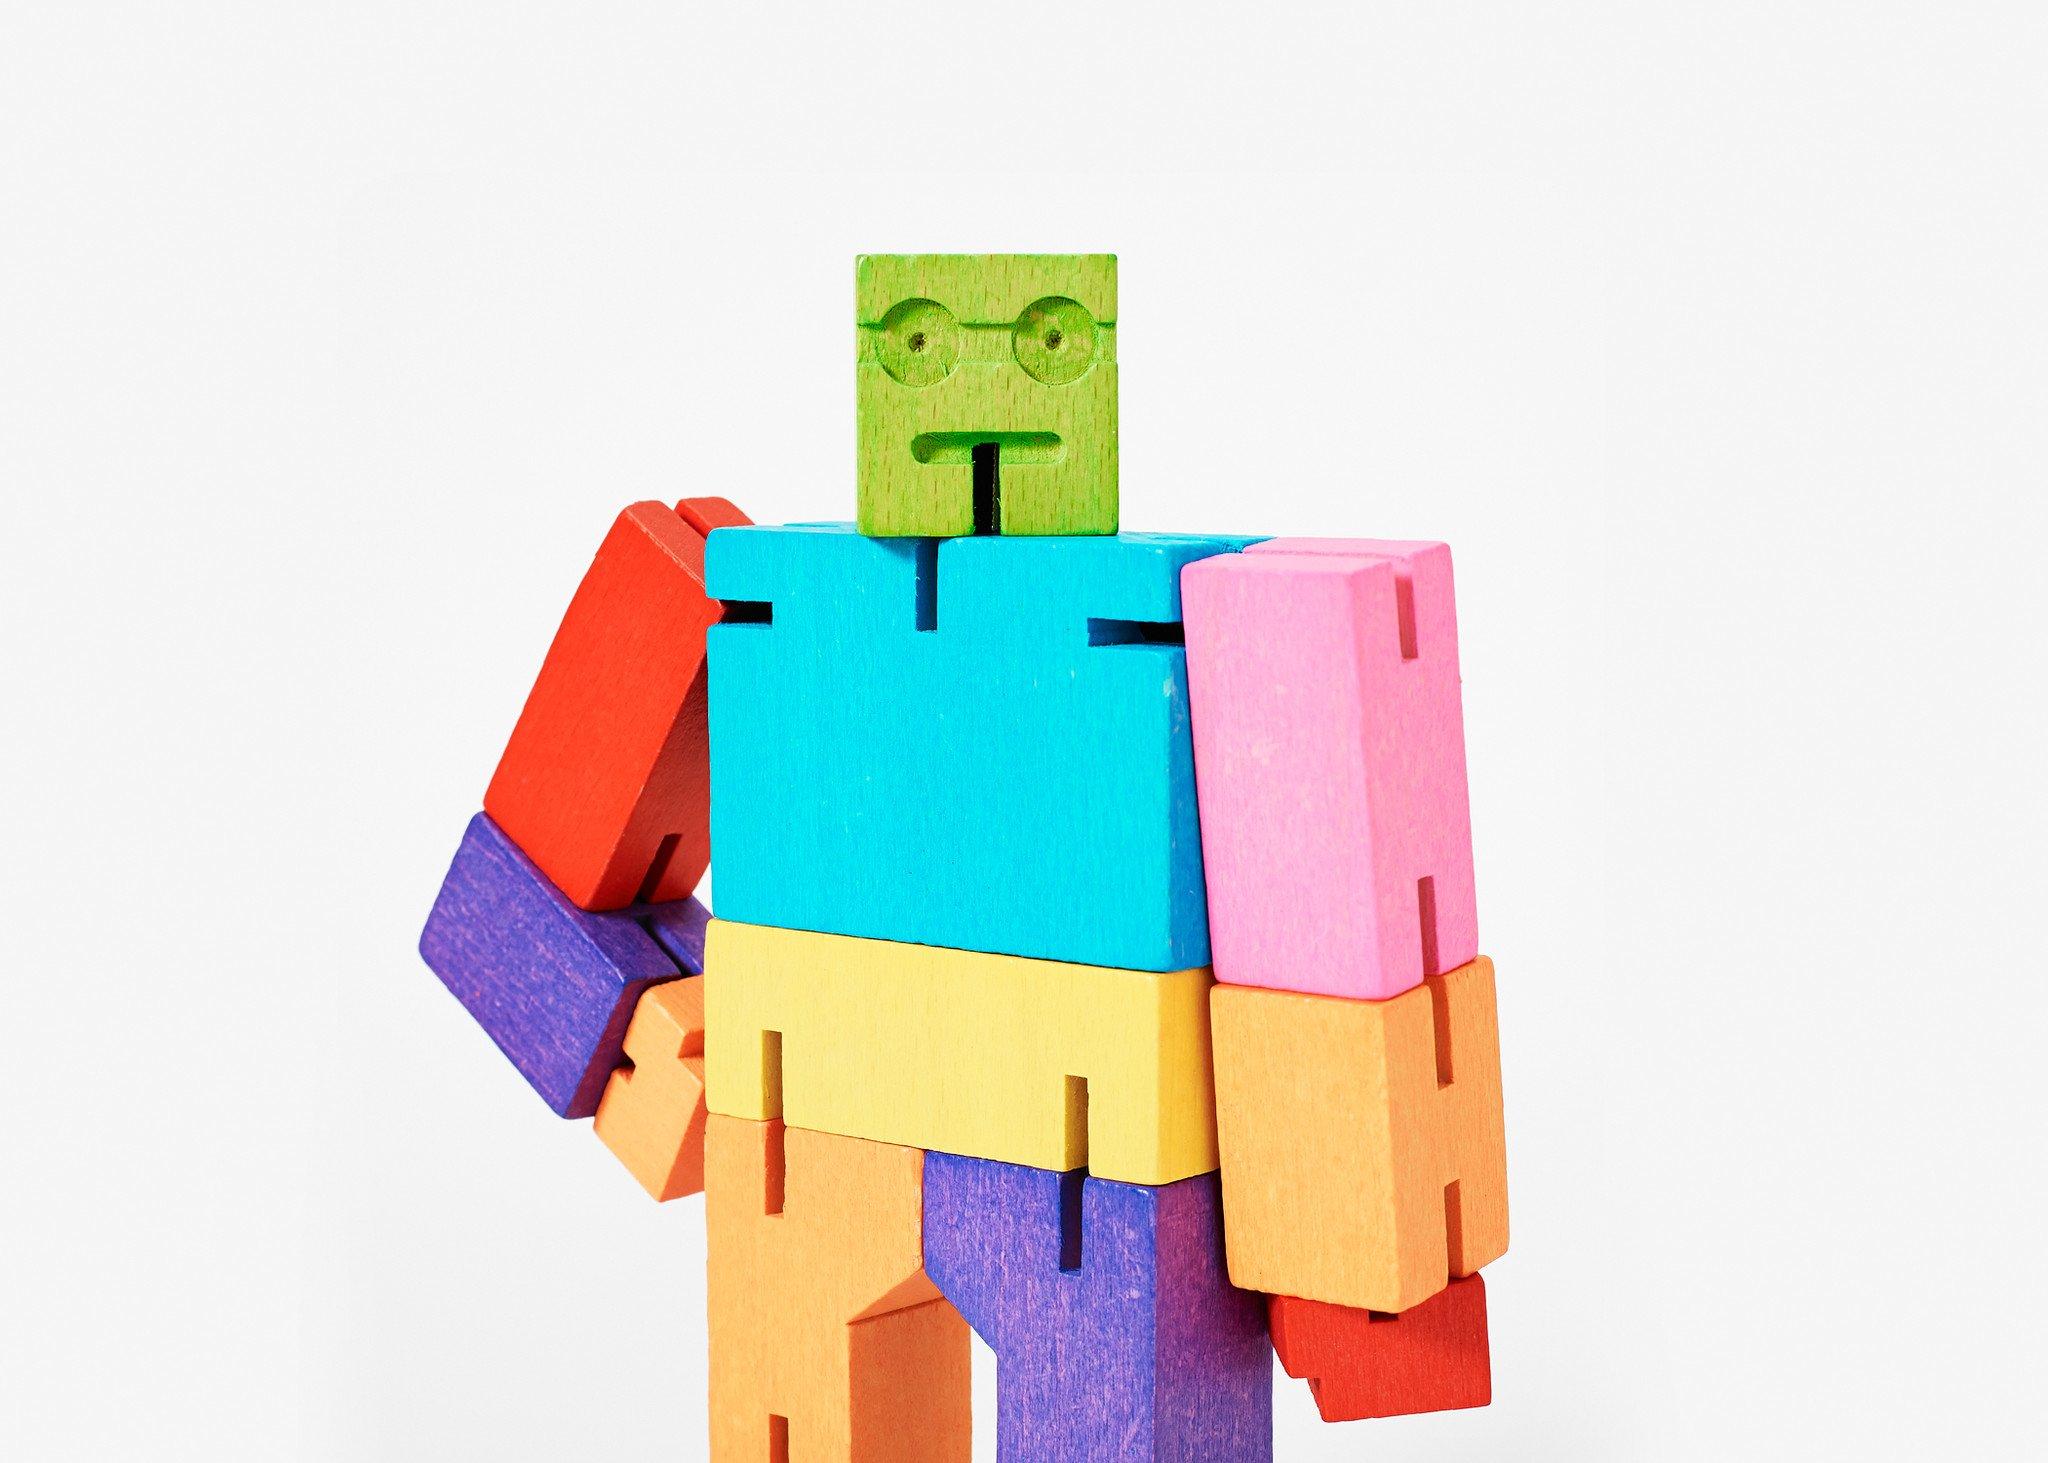 Cubebot-multi-headshot-vert-DWCM_1637a055-c0e6-490f-8691-b557fcb0736f_3600x.jpg